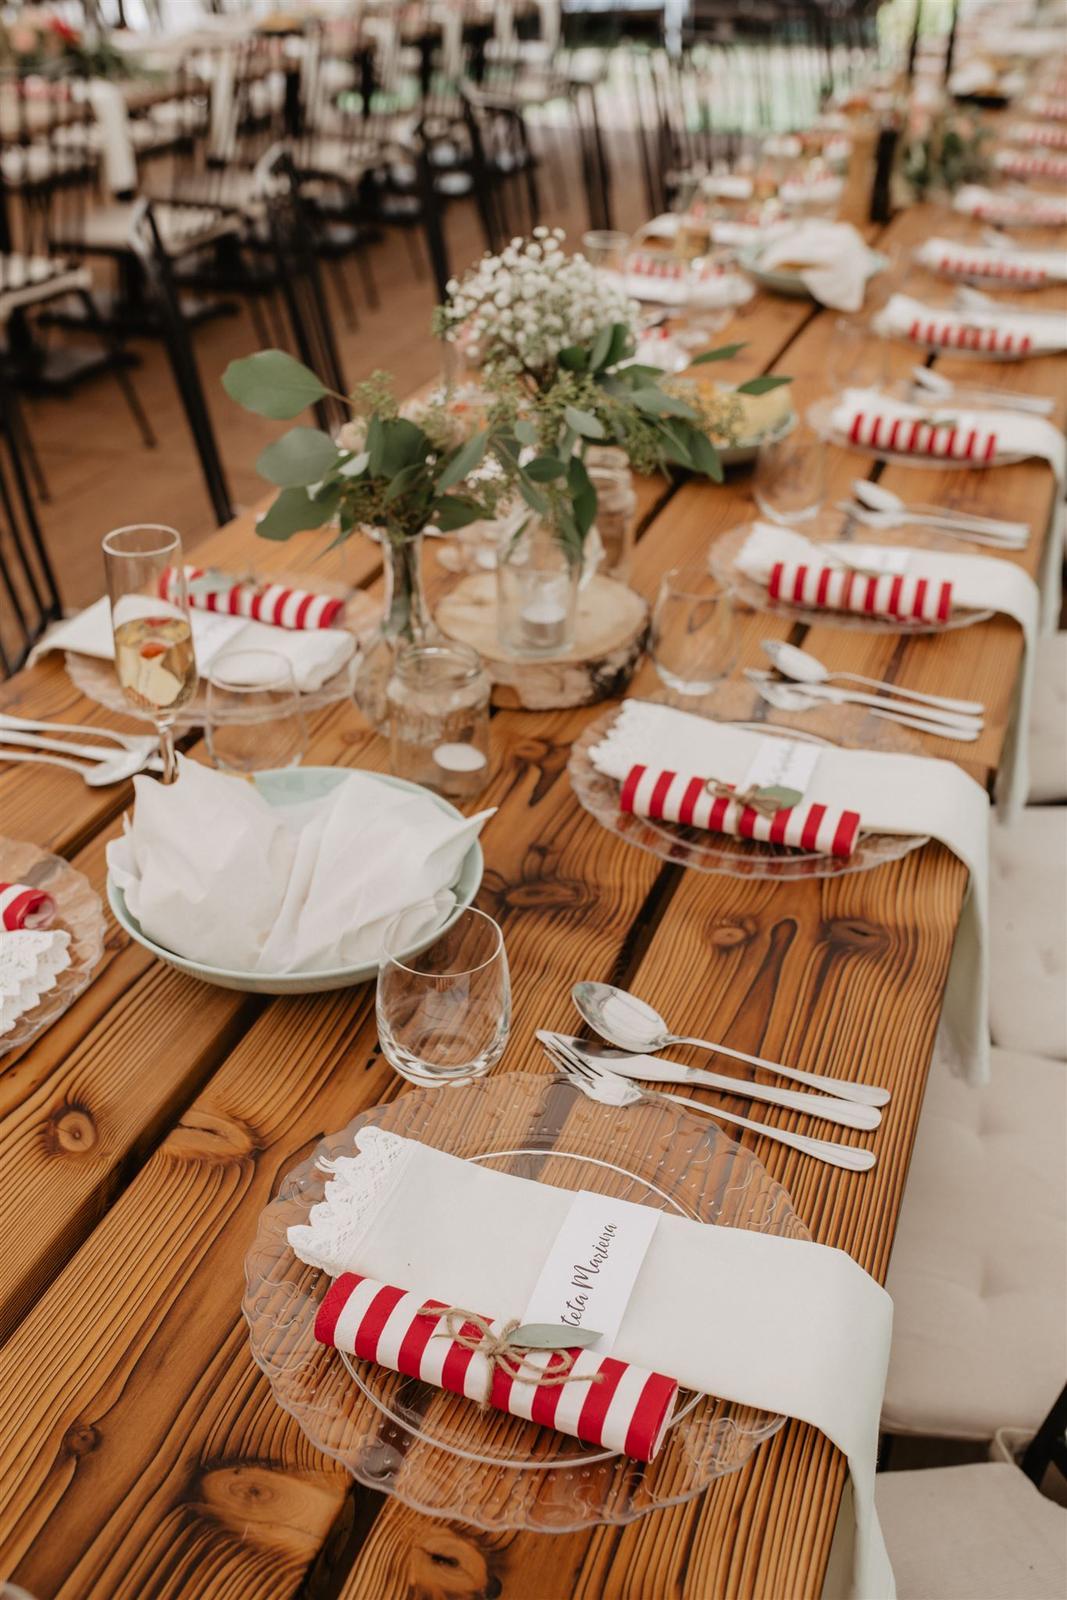 Krásna a romantická svadobná party v záhrade reštaurácie Bistra Dukát - Le Gout v srdci B. Bystrice. - Obrázok č. 10